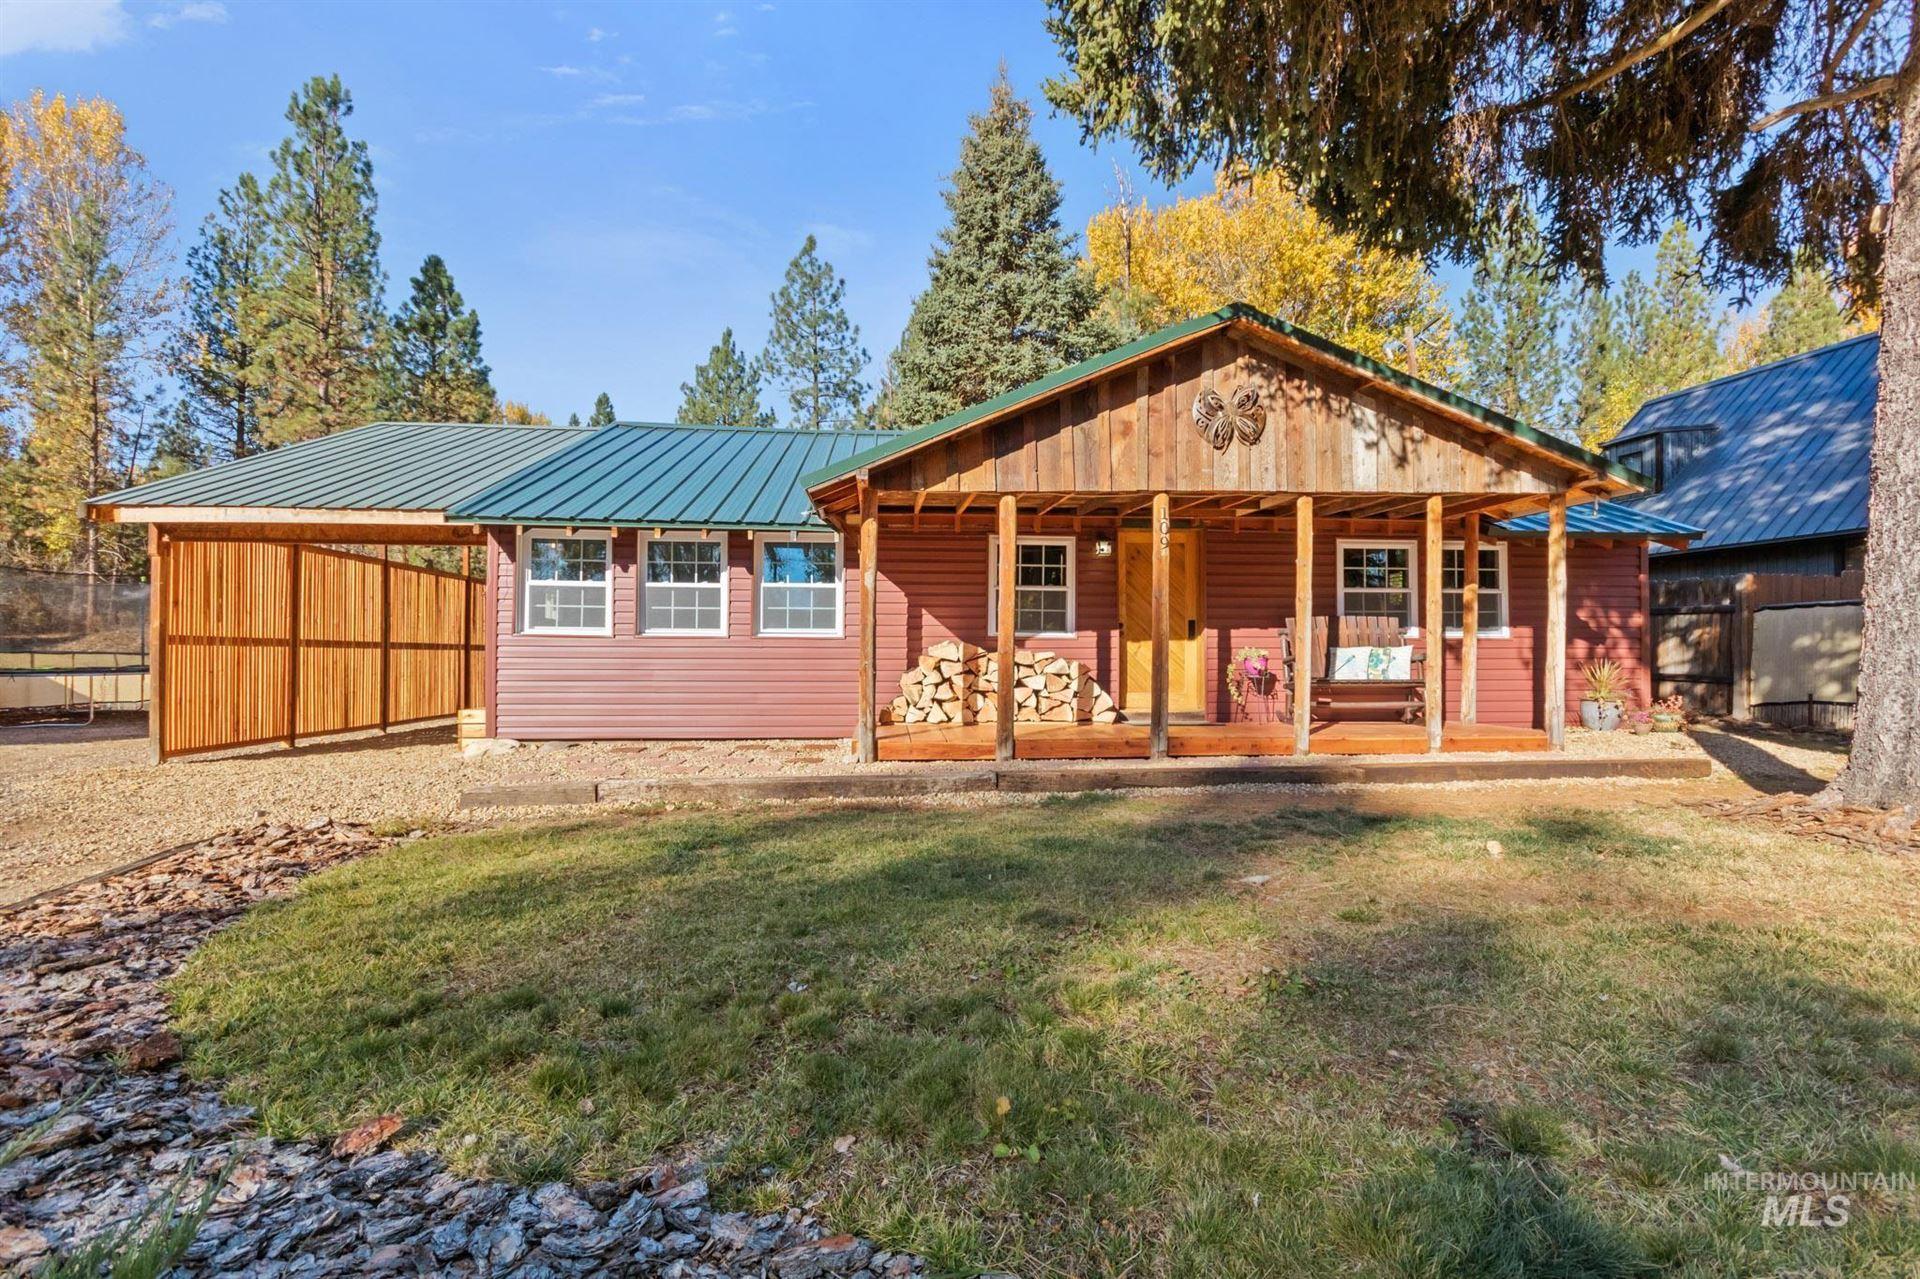 109 Cottonwood Street, Idaho City, ID 83631 - MLS#: 98822280